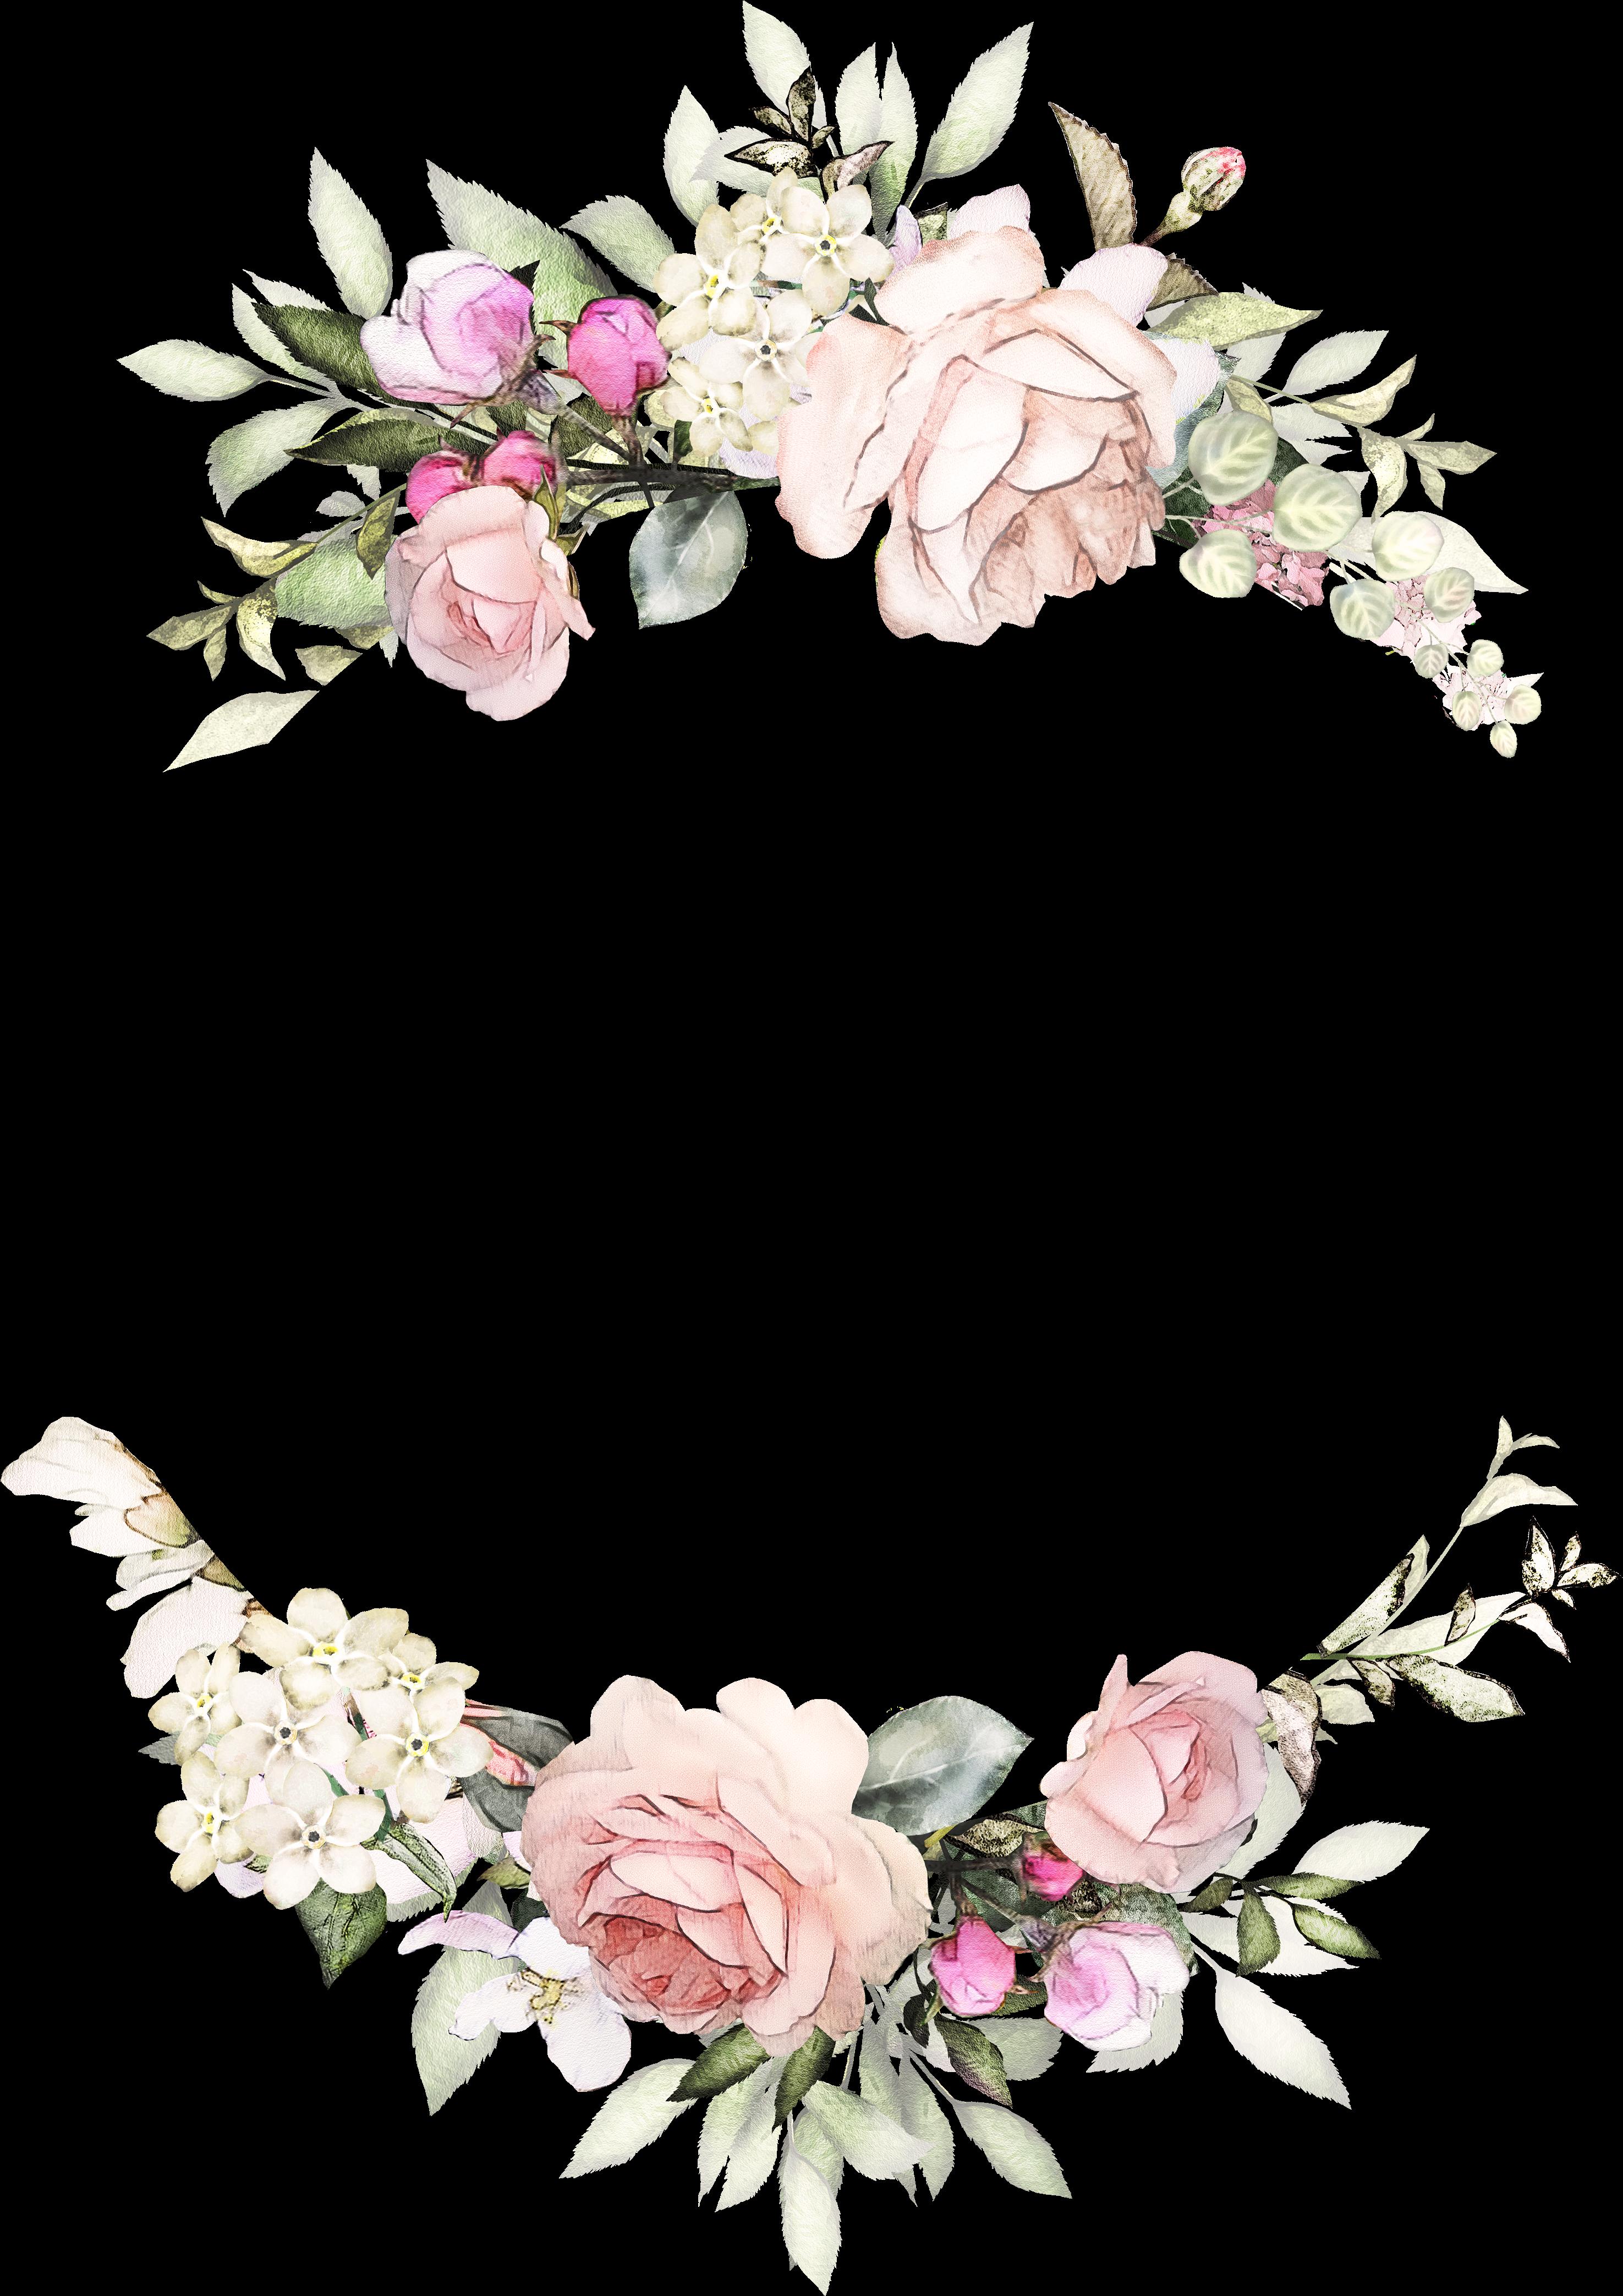 Transparent wreath clipart transparent background - Vintage Rose Wreath Invitations Paper Design Invitation - Floral Backgrounds For Wedding Invitations